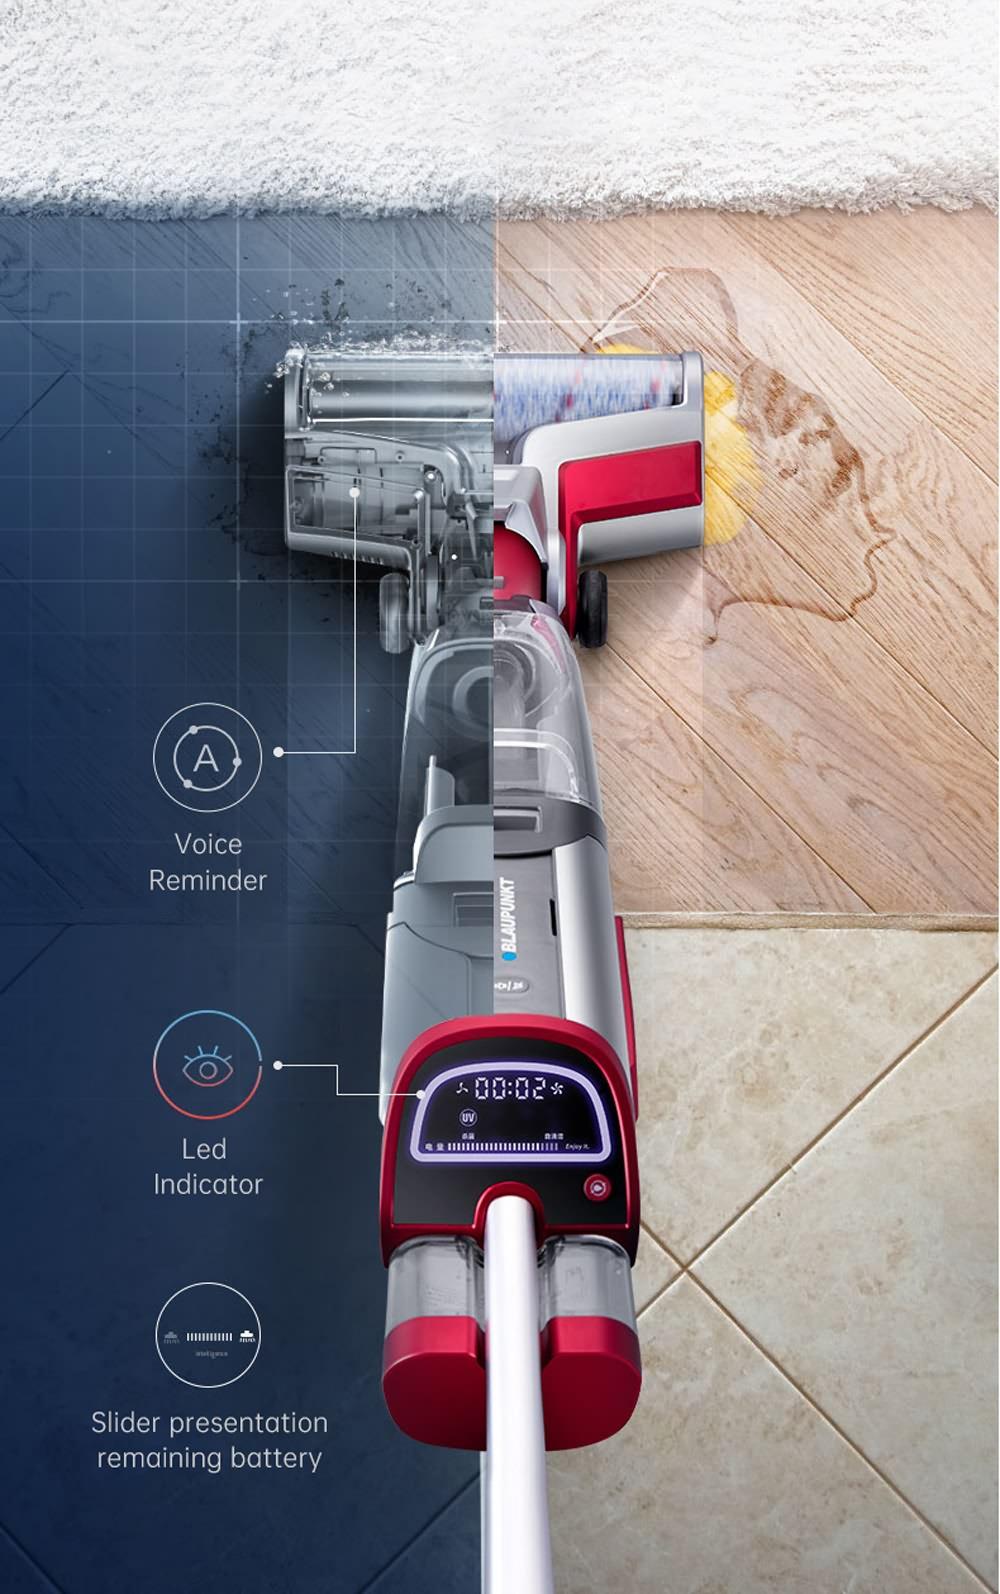 Cordless floor cleaner (6)